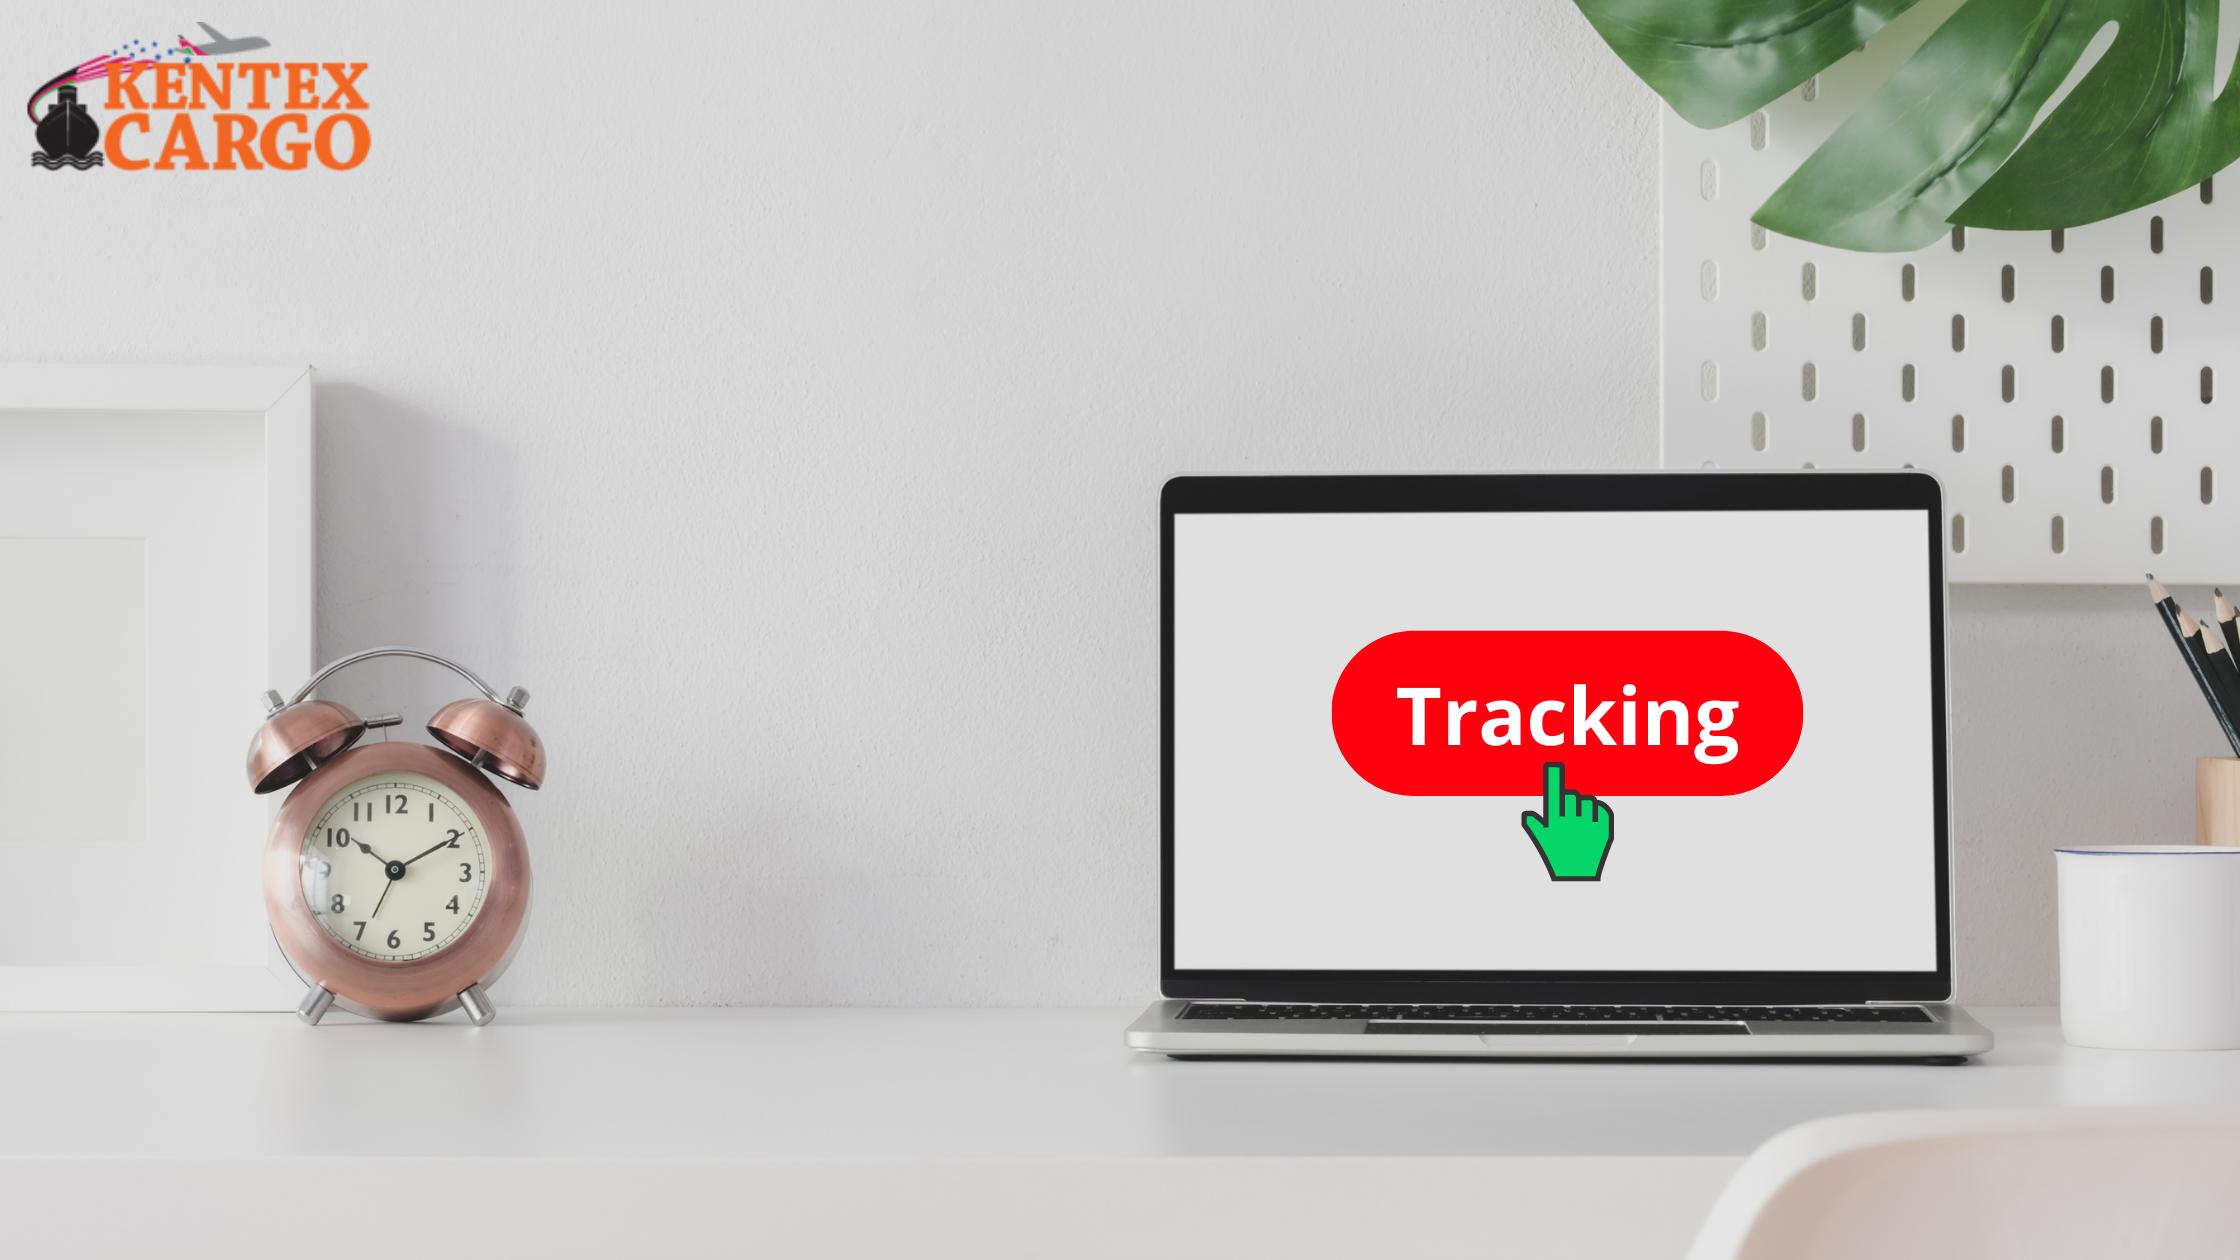 Kentex Cargo Tracking